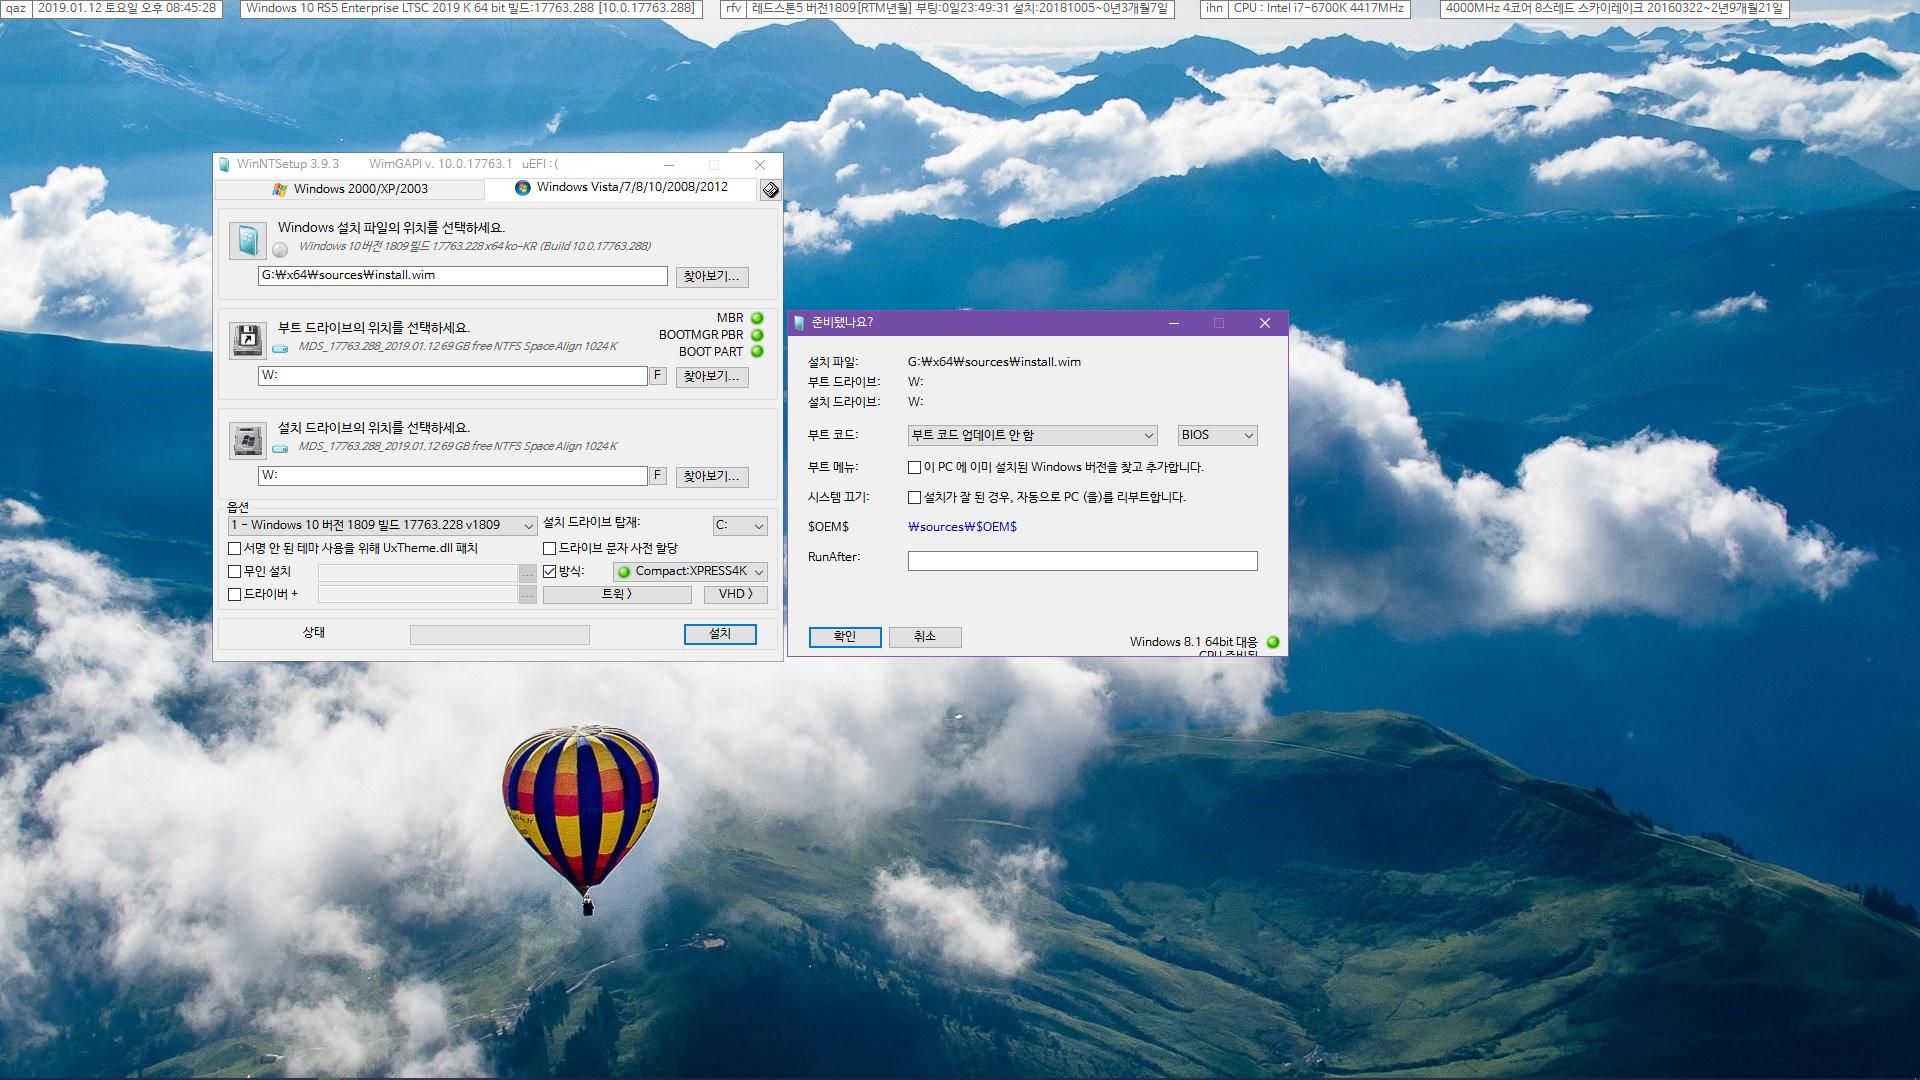 Windows 10 버전 1809 빌드 17763.228 (2019.1.15일) 파일은 17763.288 빌드 입니다 - vmware 구경하기 2019-01-12_204529.jpg